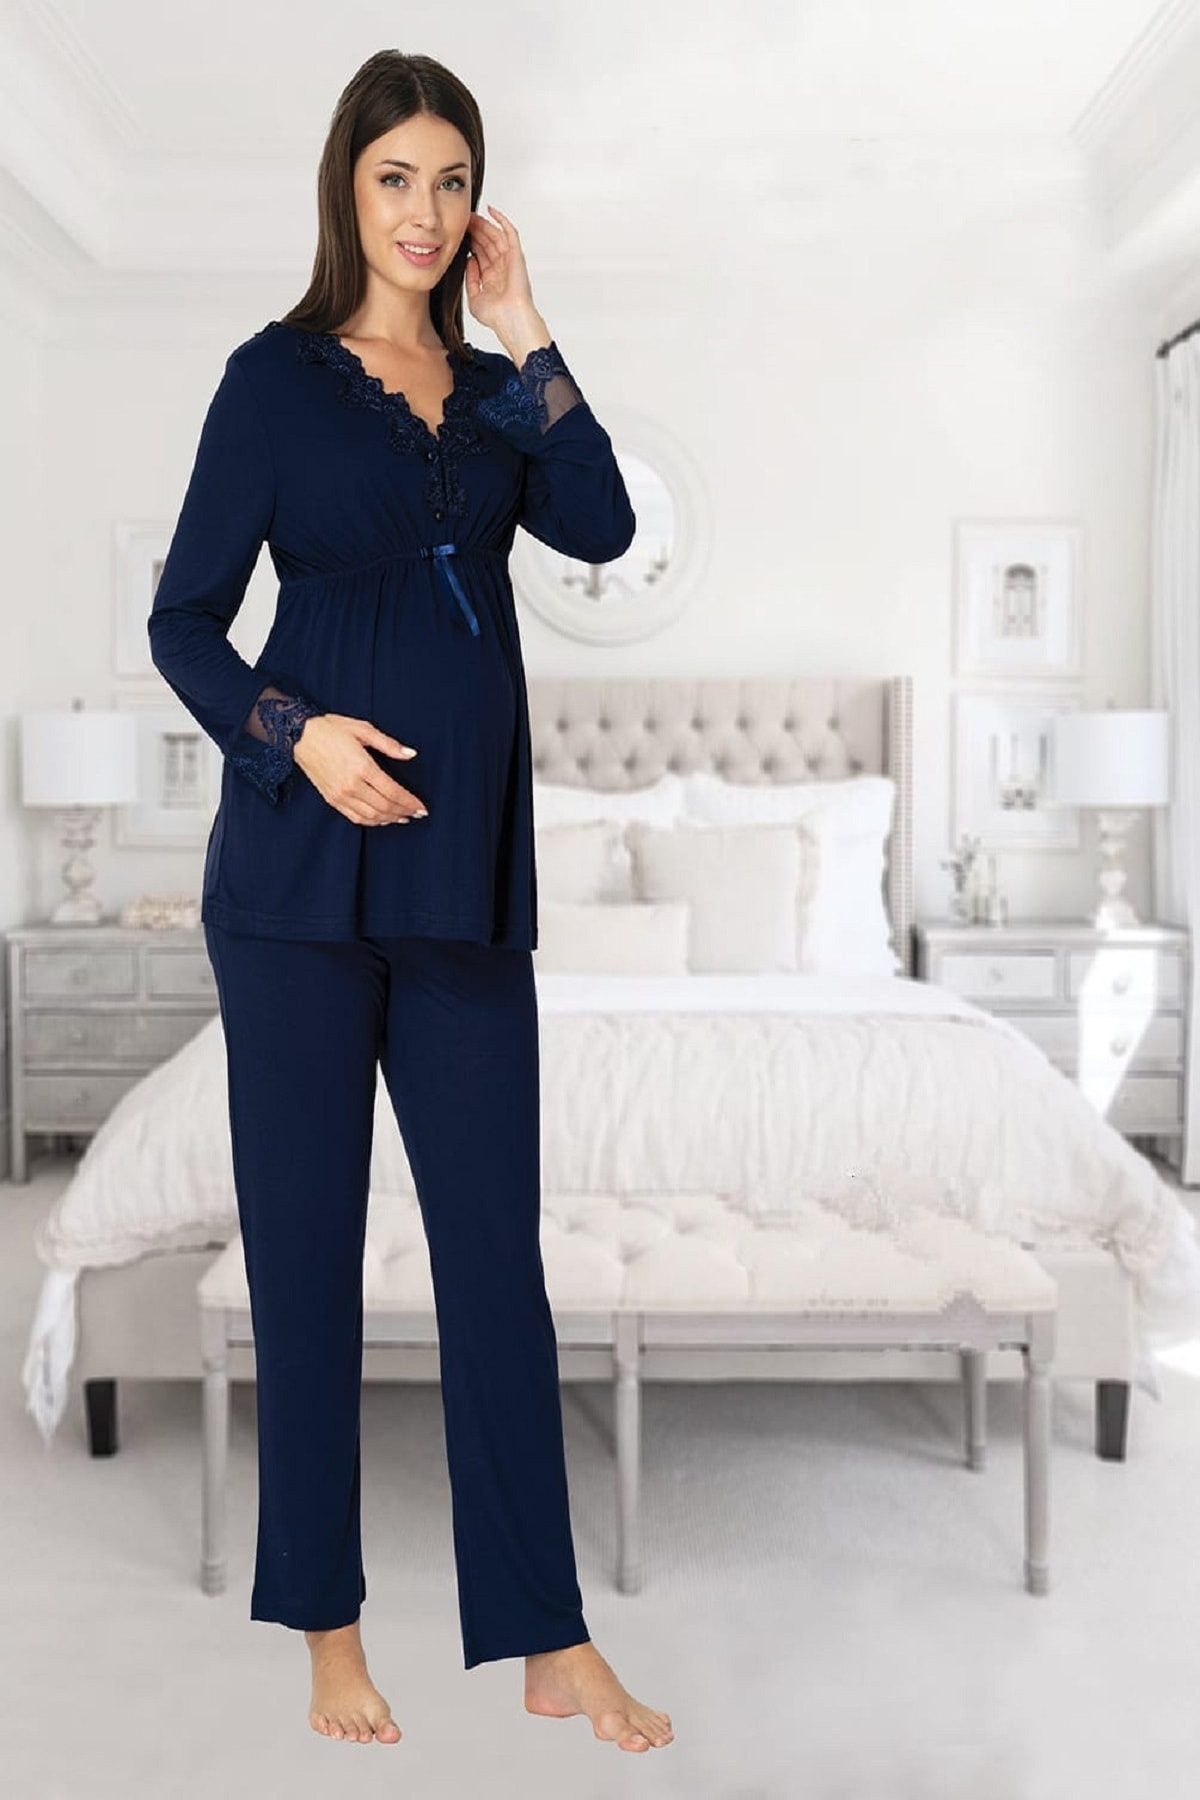 Women's Navy Blue Long Sleeve Pajamas Set Nightgown Dressing Gown Puerperal Maternity 4'lü Set enlarge